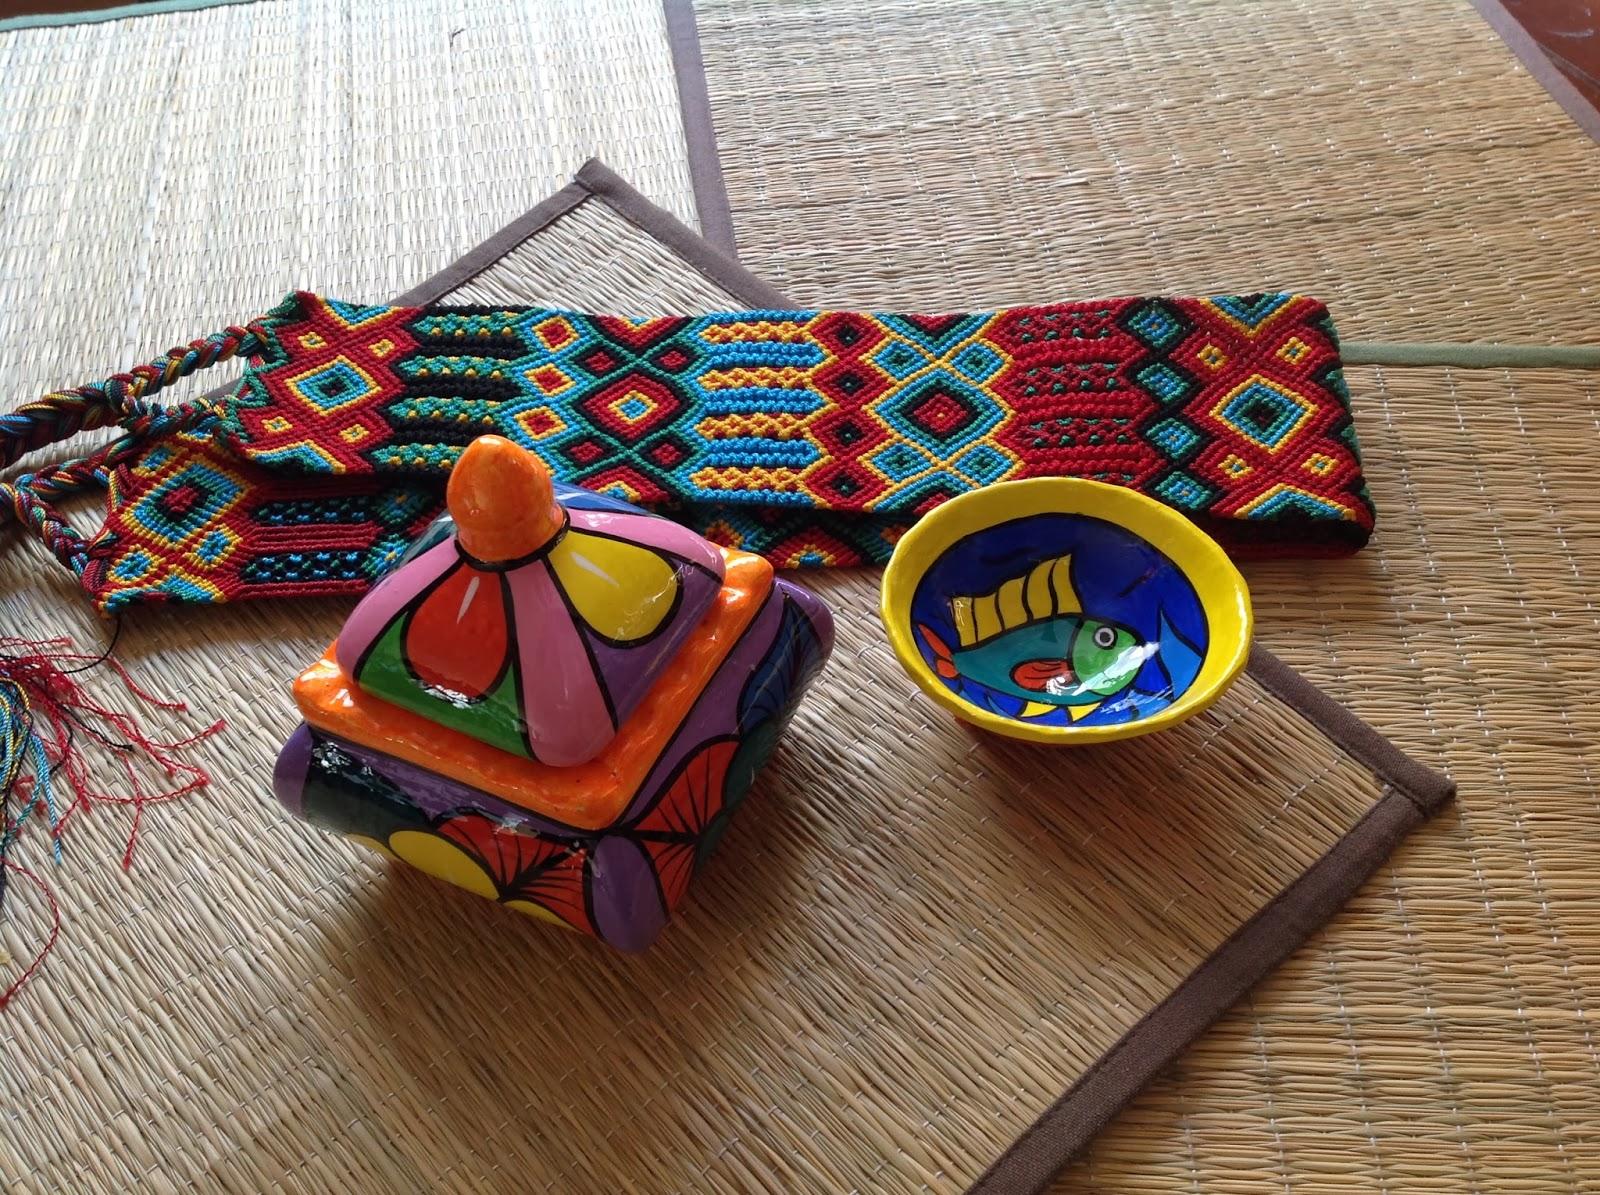 sandalwood craft Explore culture art group's board sandalwood handicraft items on  pinterest   see more ideas about craft, crafts and hand crafts.